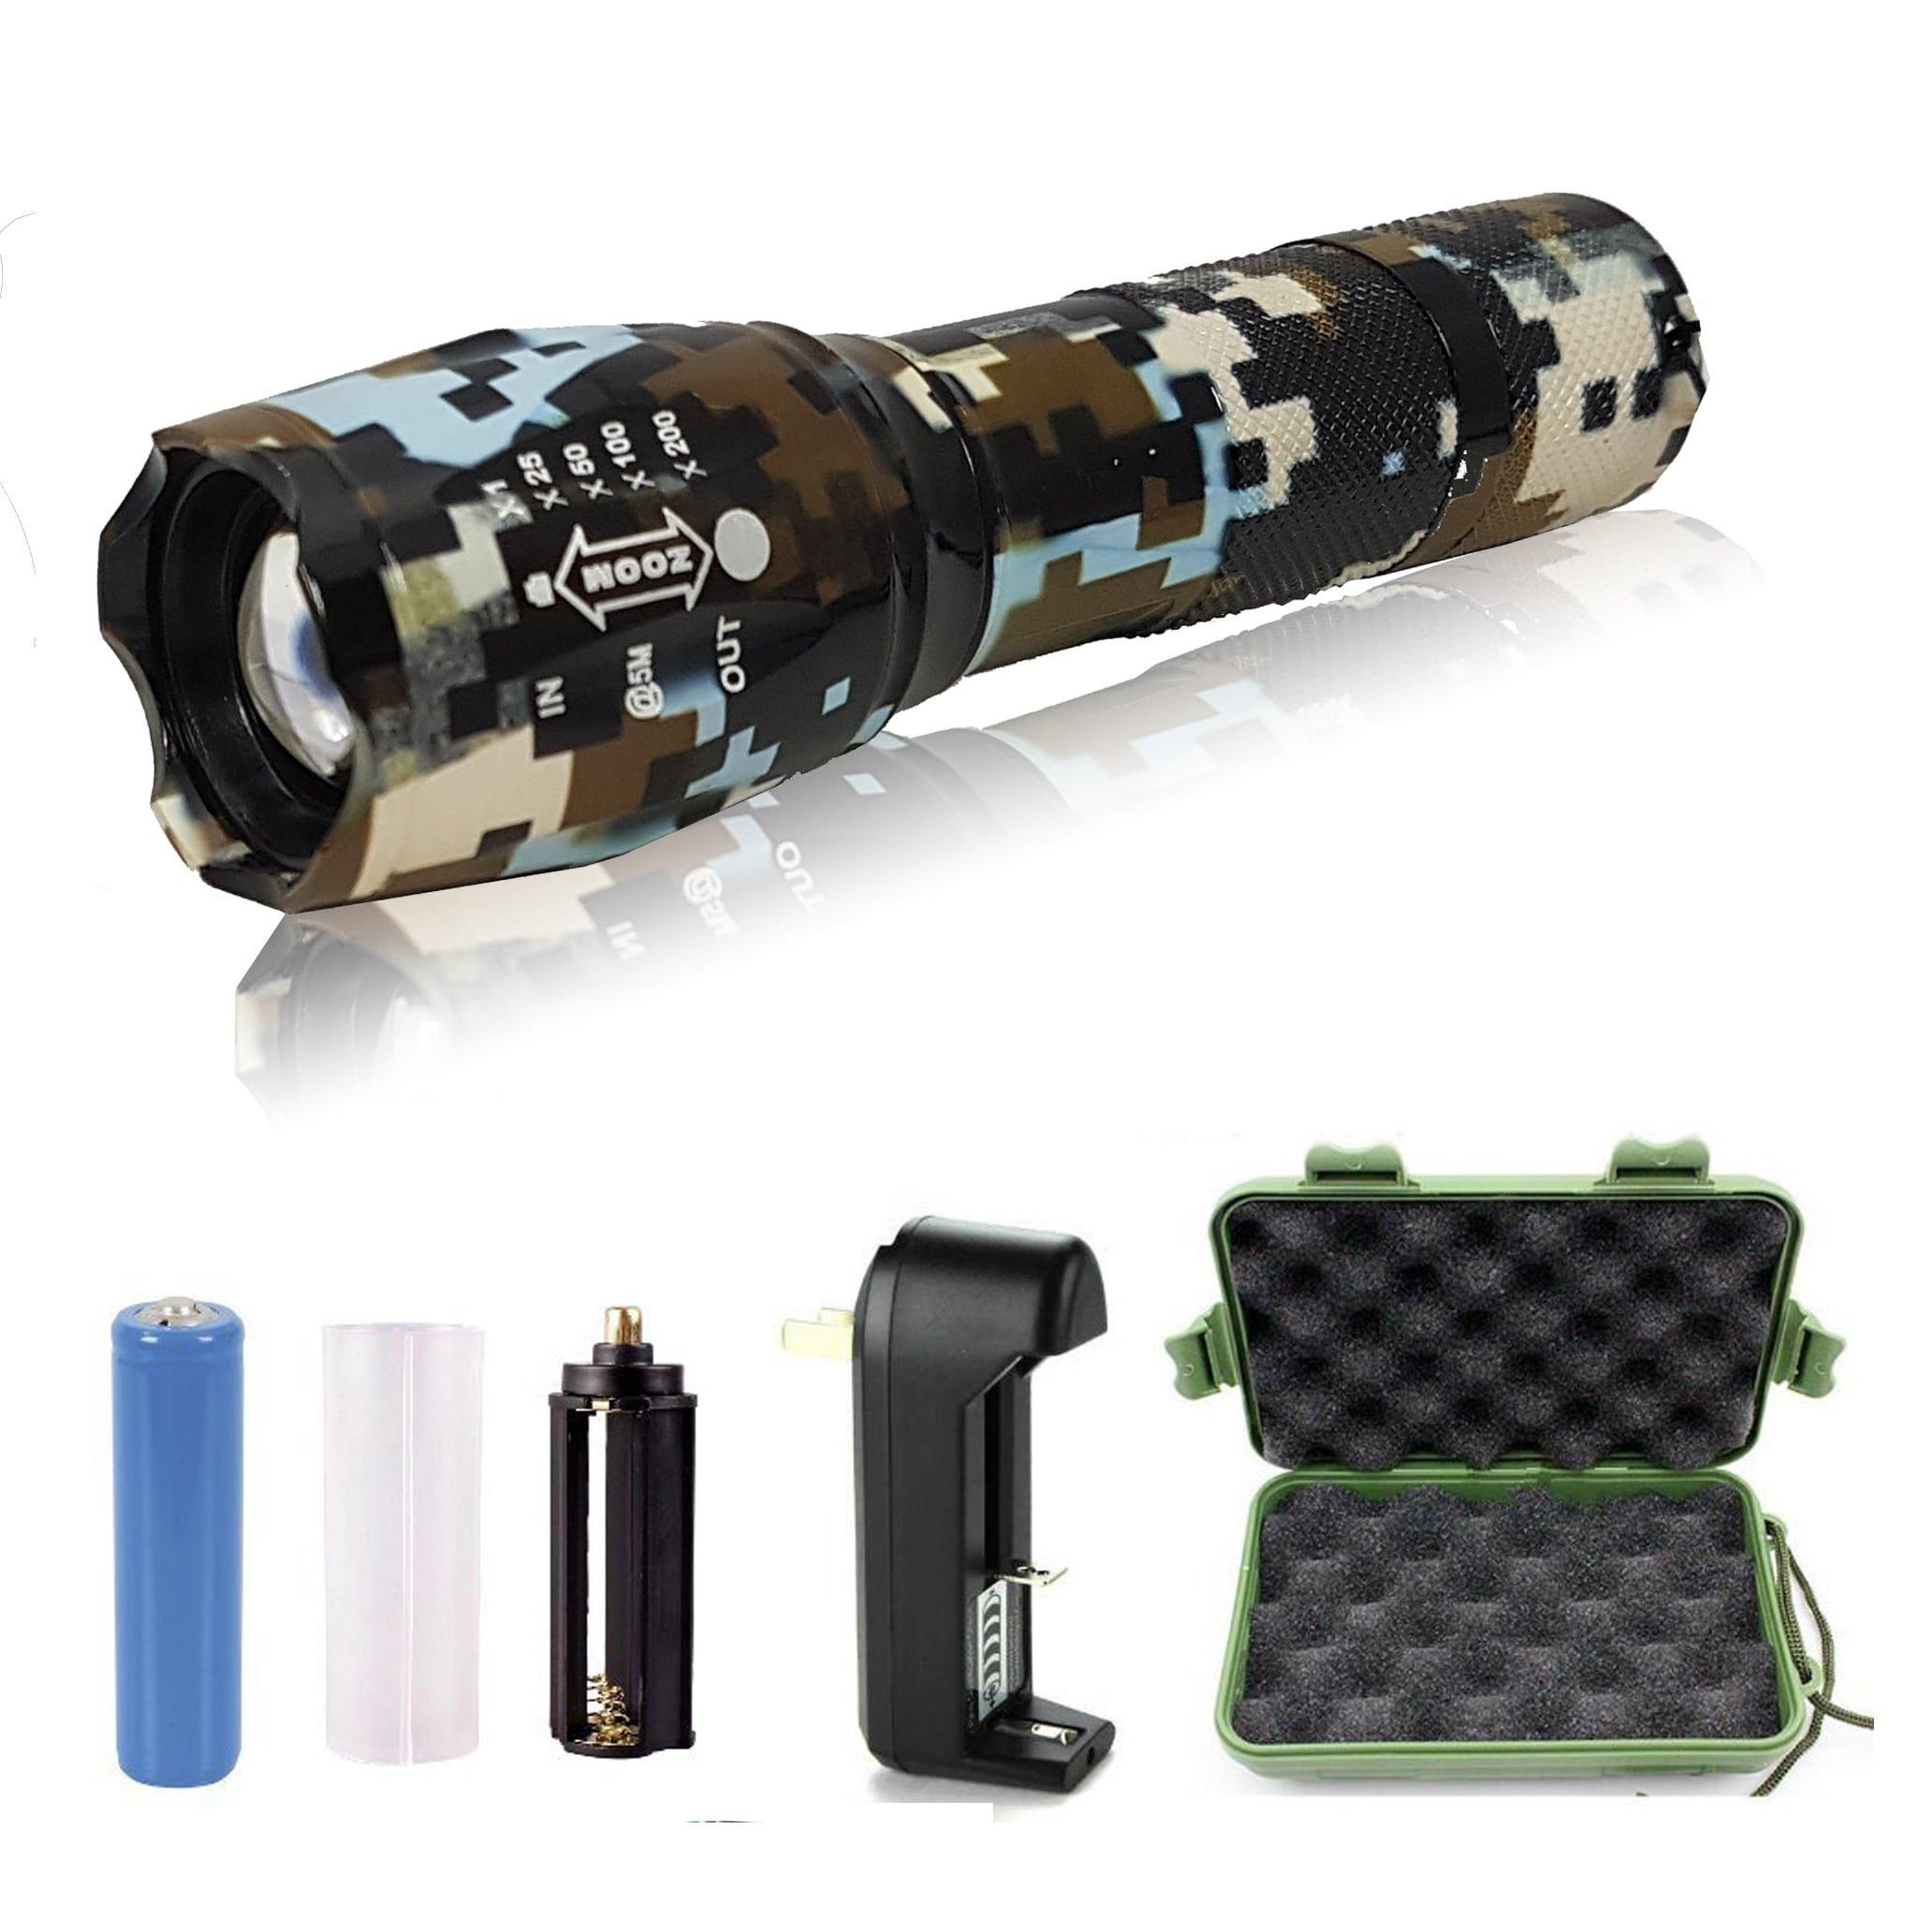 5starsuperdeals Rechargable Plastic/Aluminum 5-mode, Adjustable-focus, Ultra-bright LED Flashlight Kit Camo Dark Brown